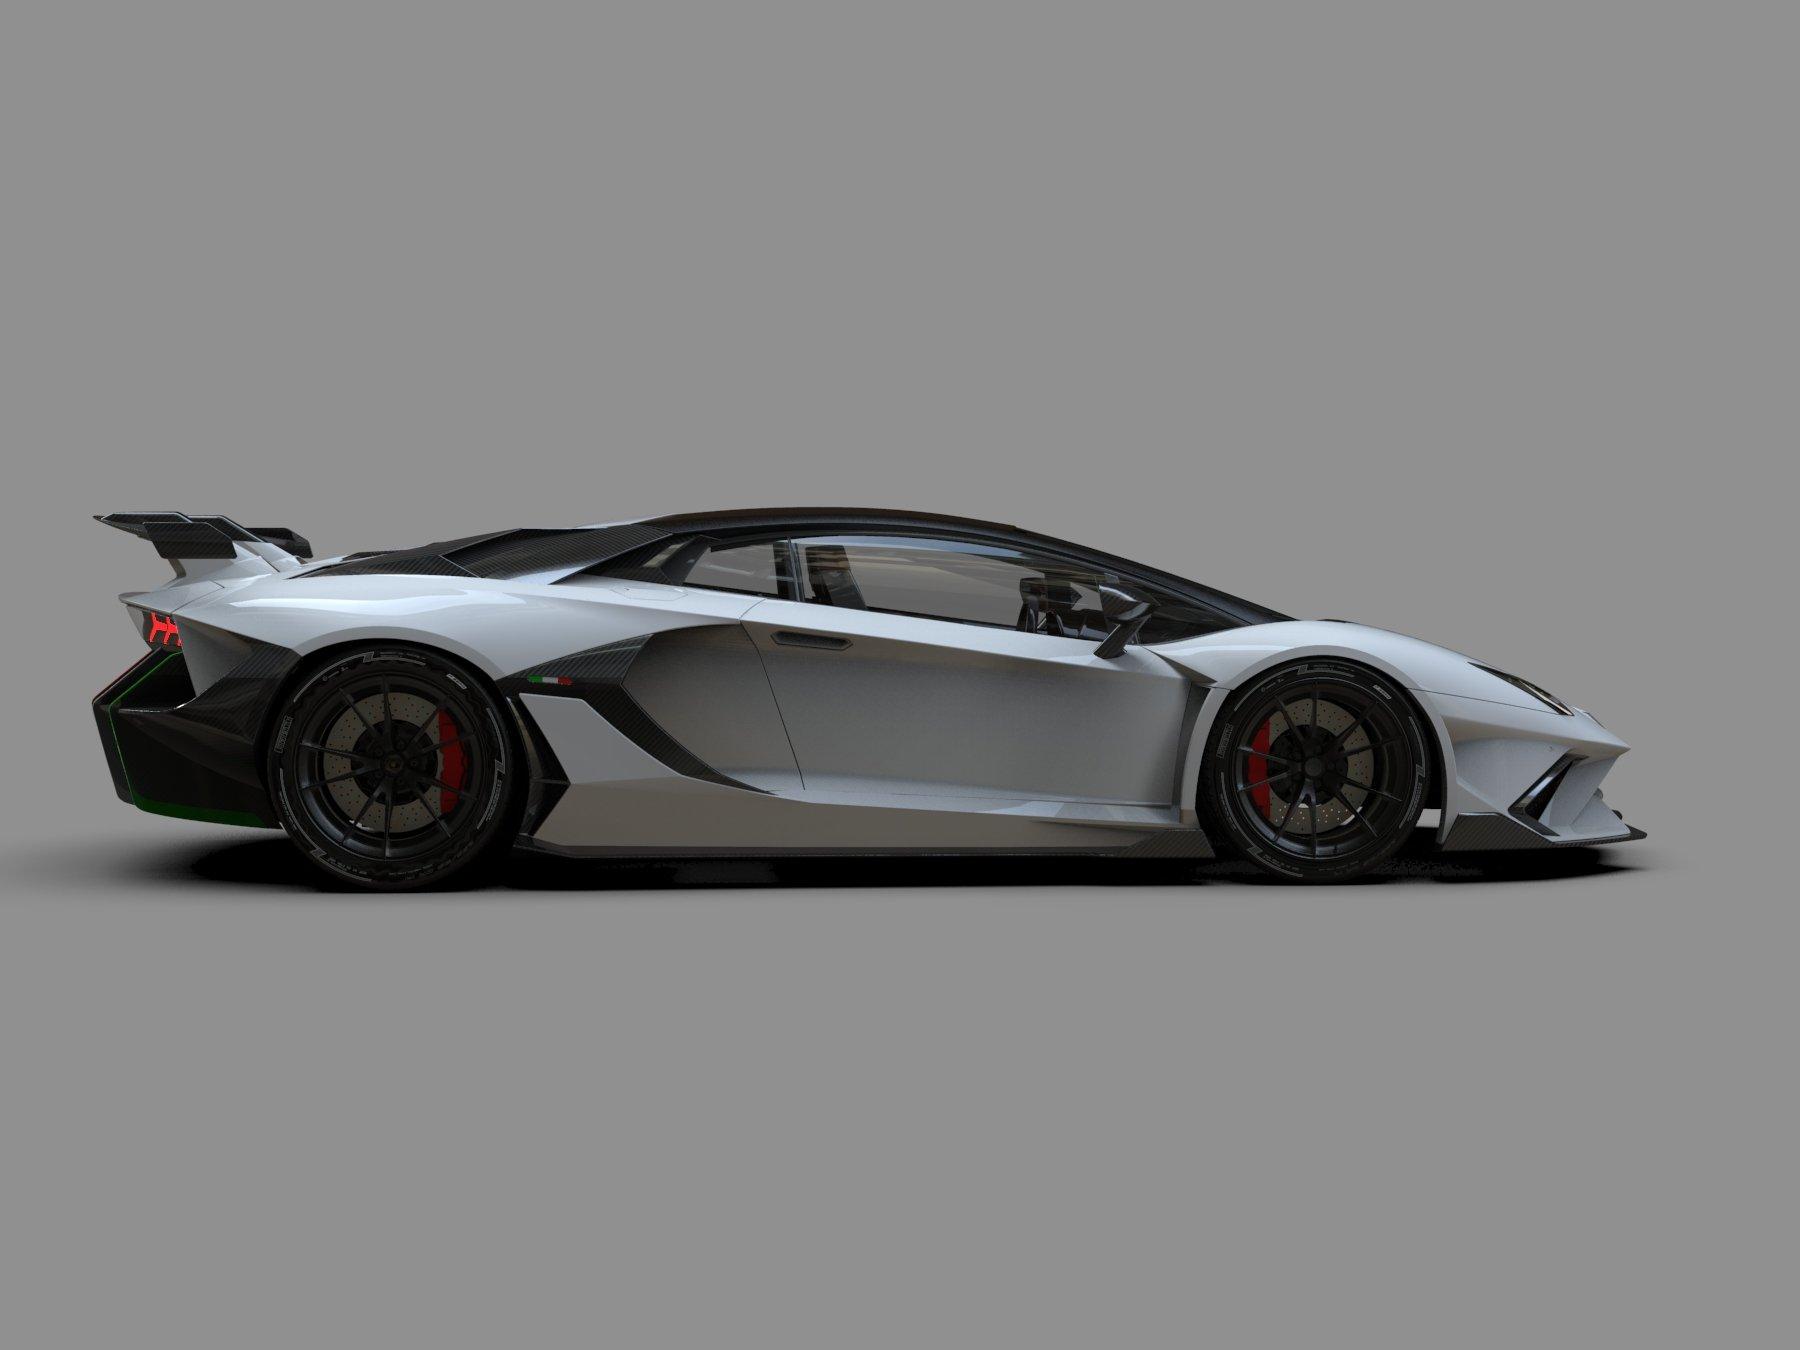 Lamborghini_Aventador_by_Duke_Dynamics_0022